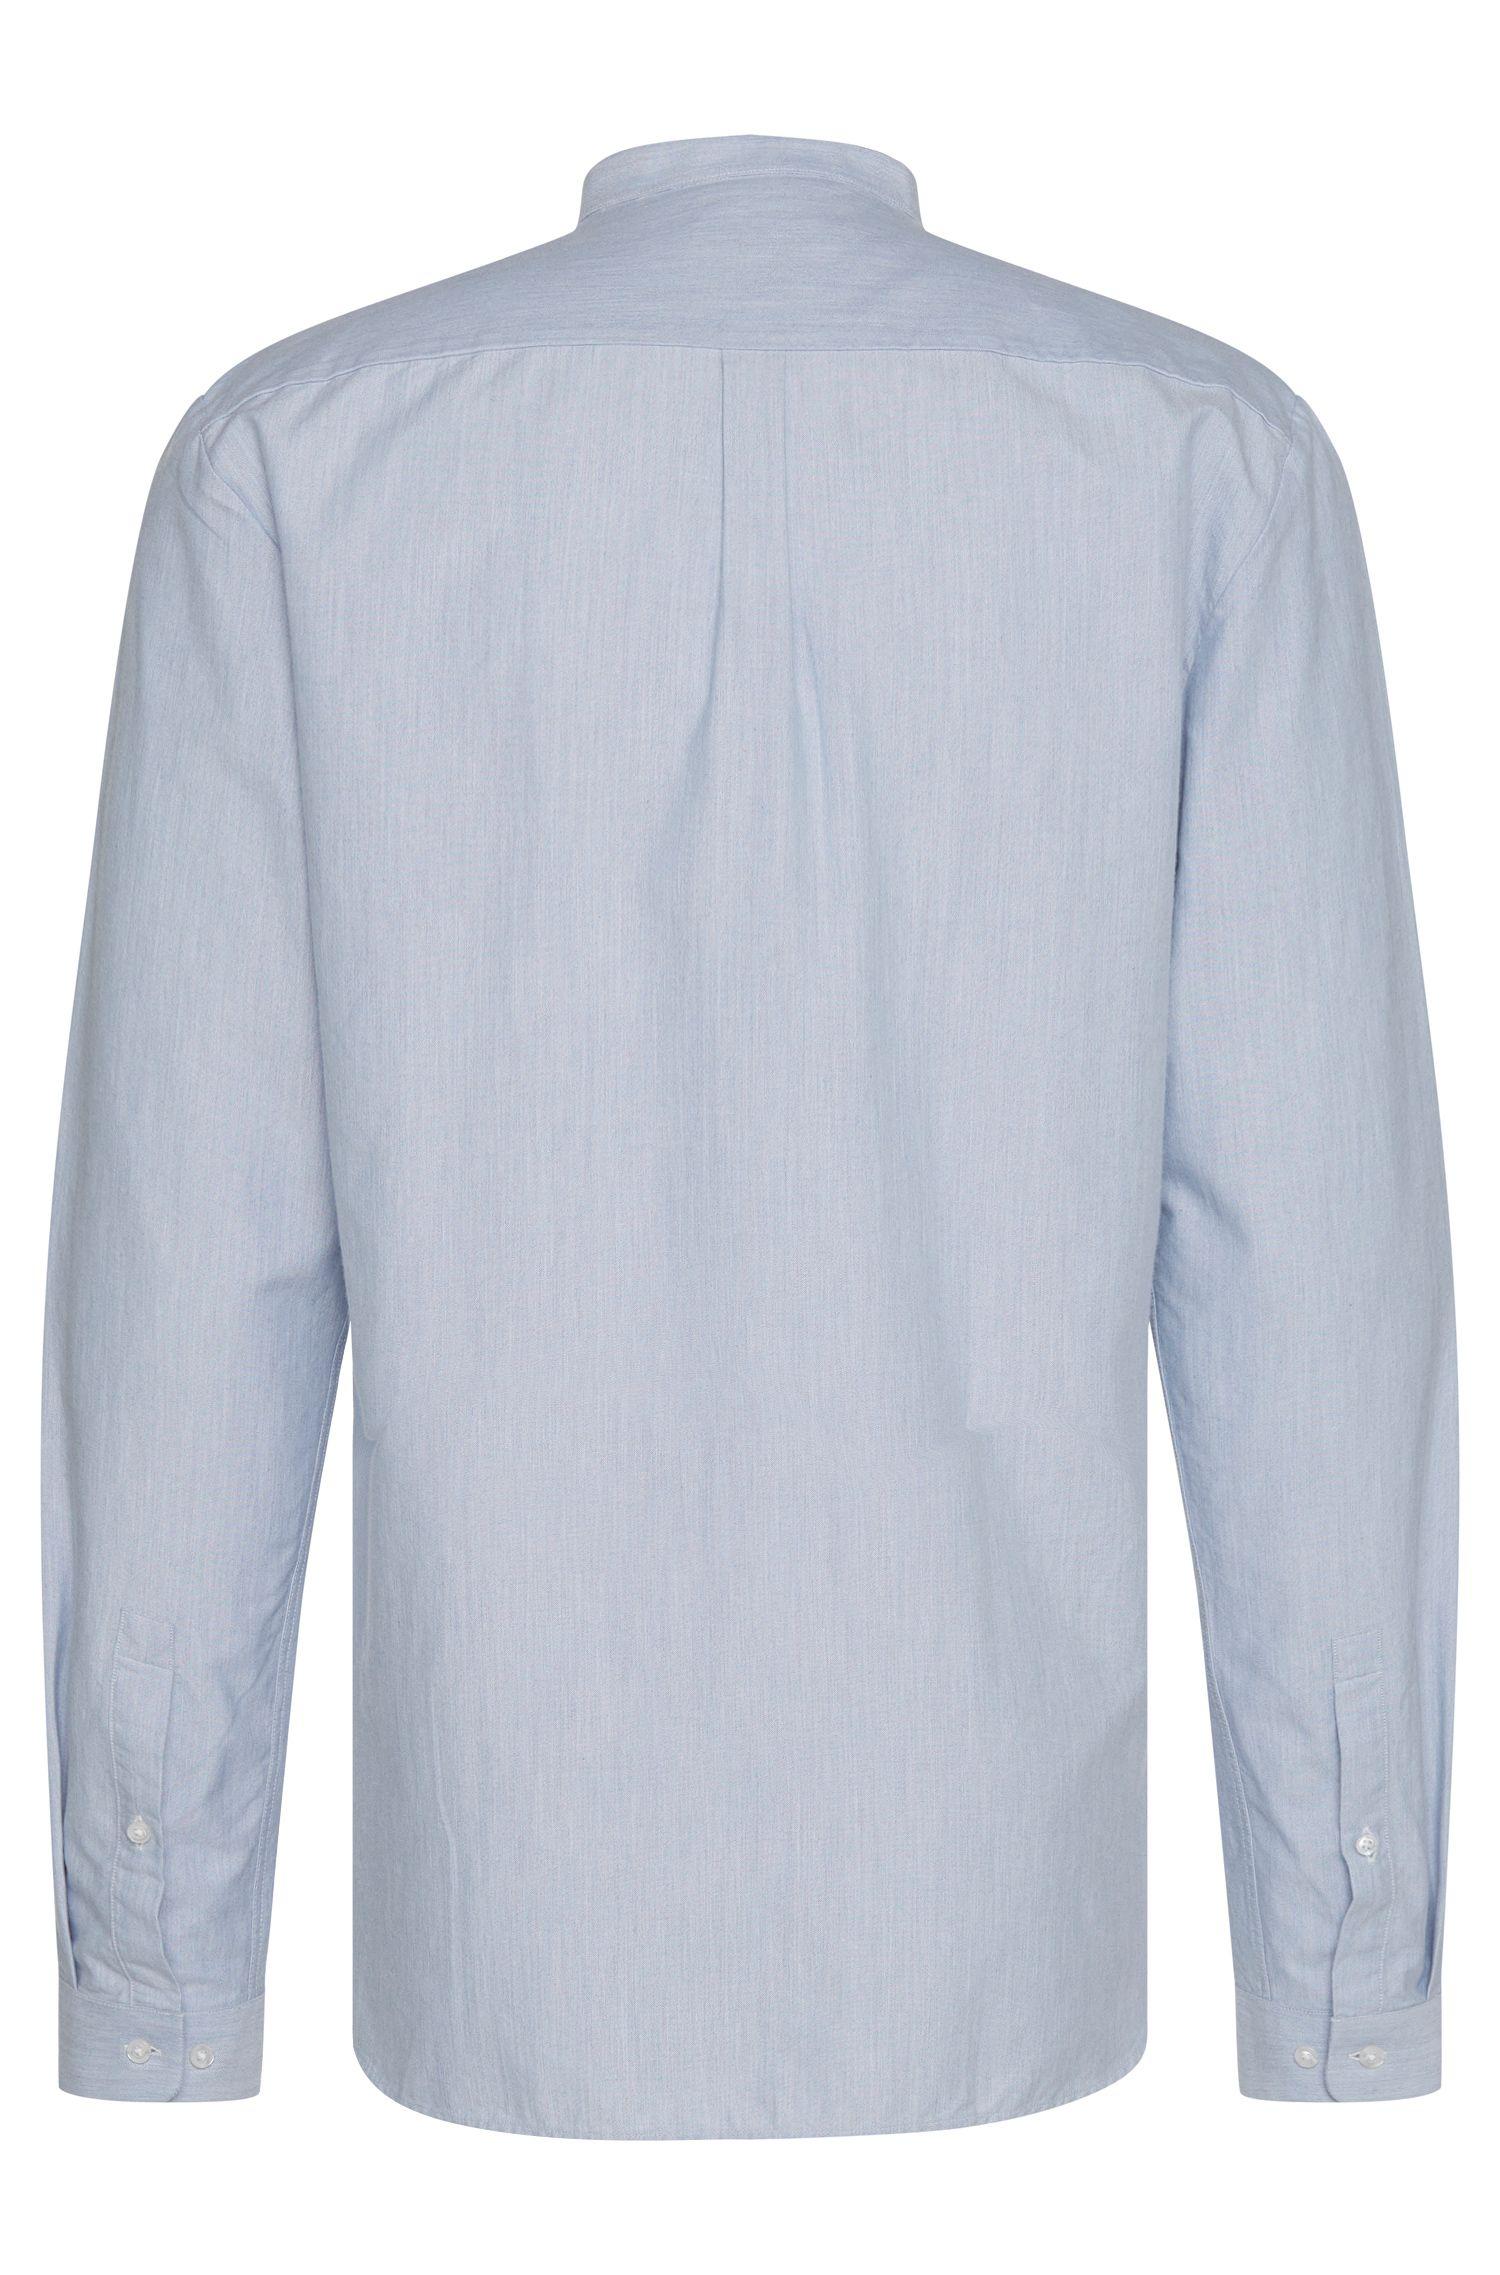 Cotton Button Down Shirt, Regular Fit | Eddison